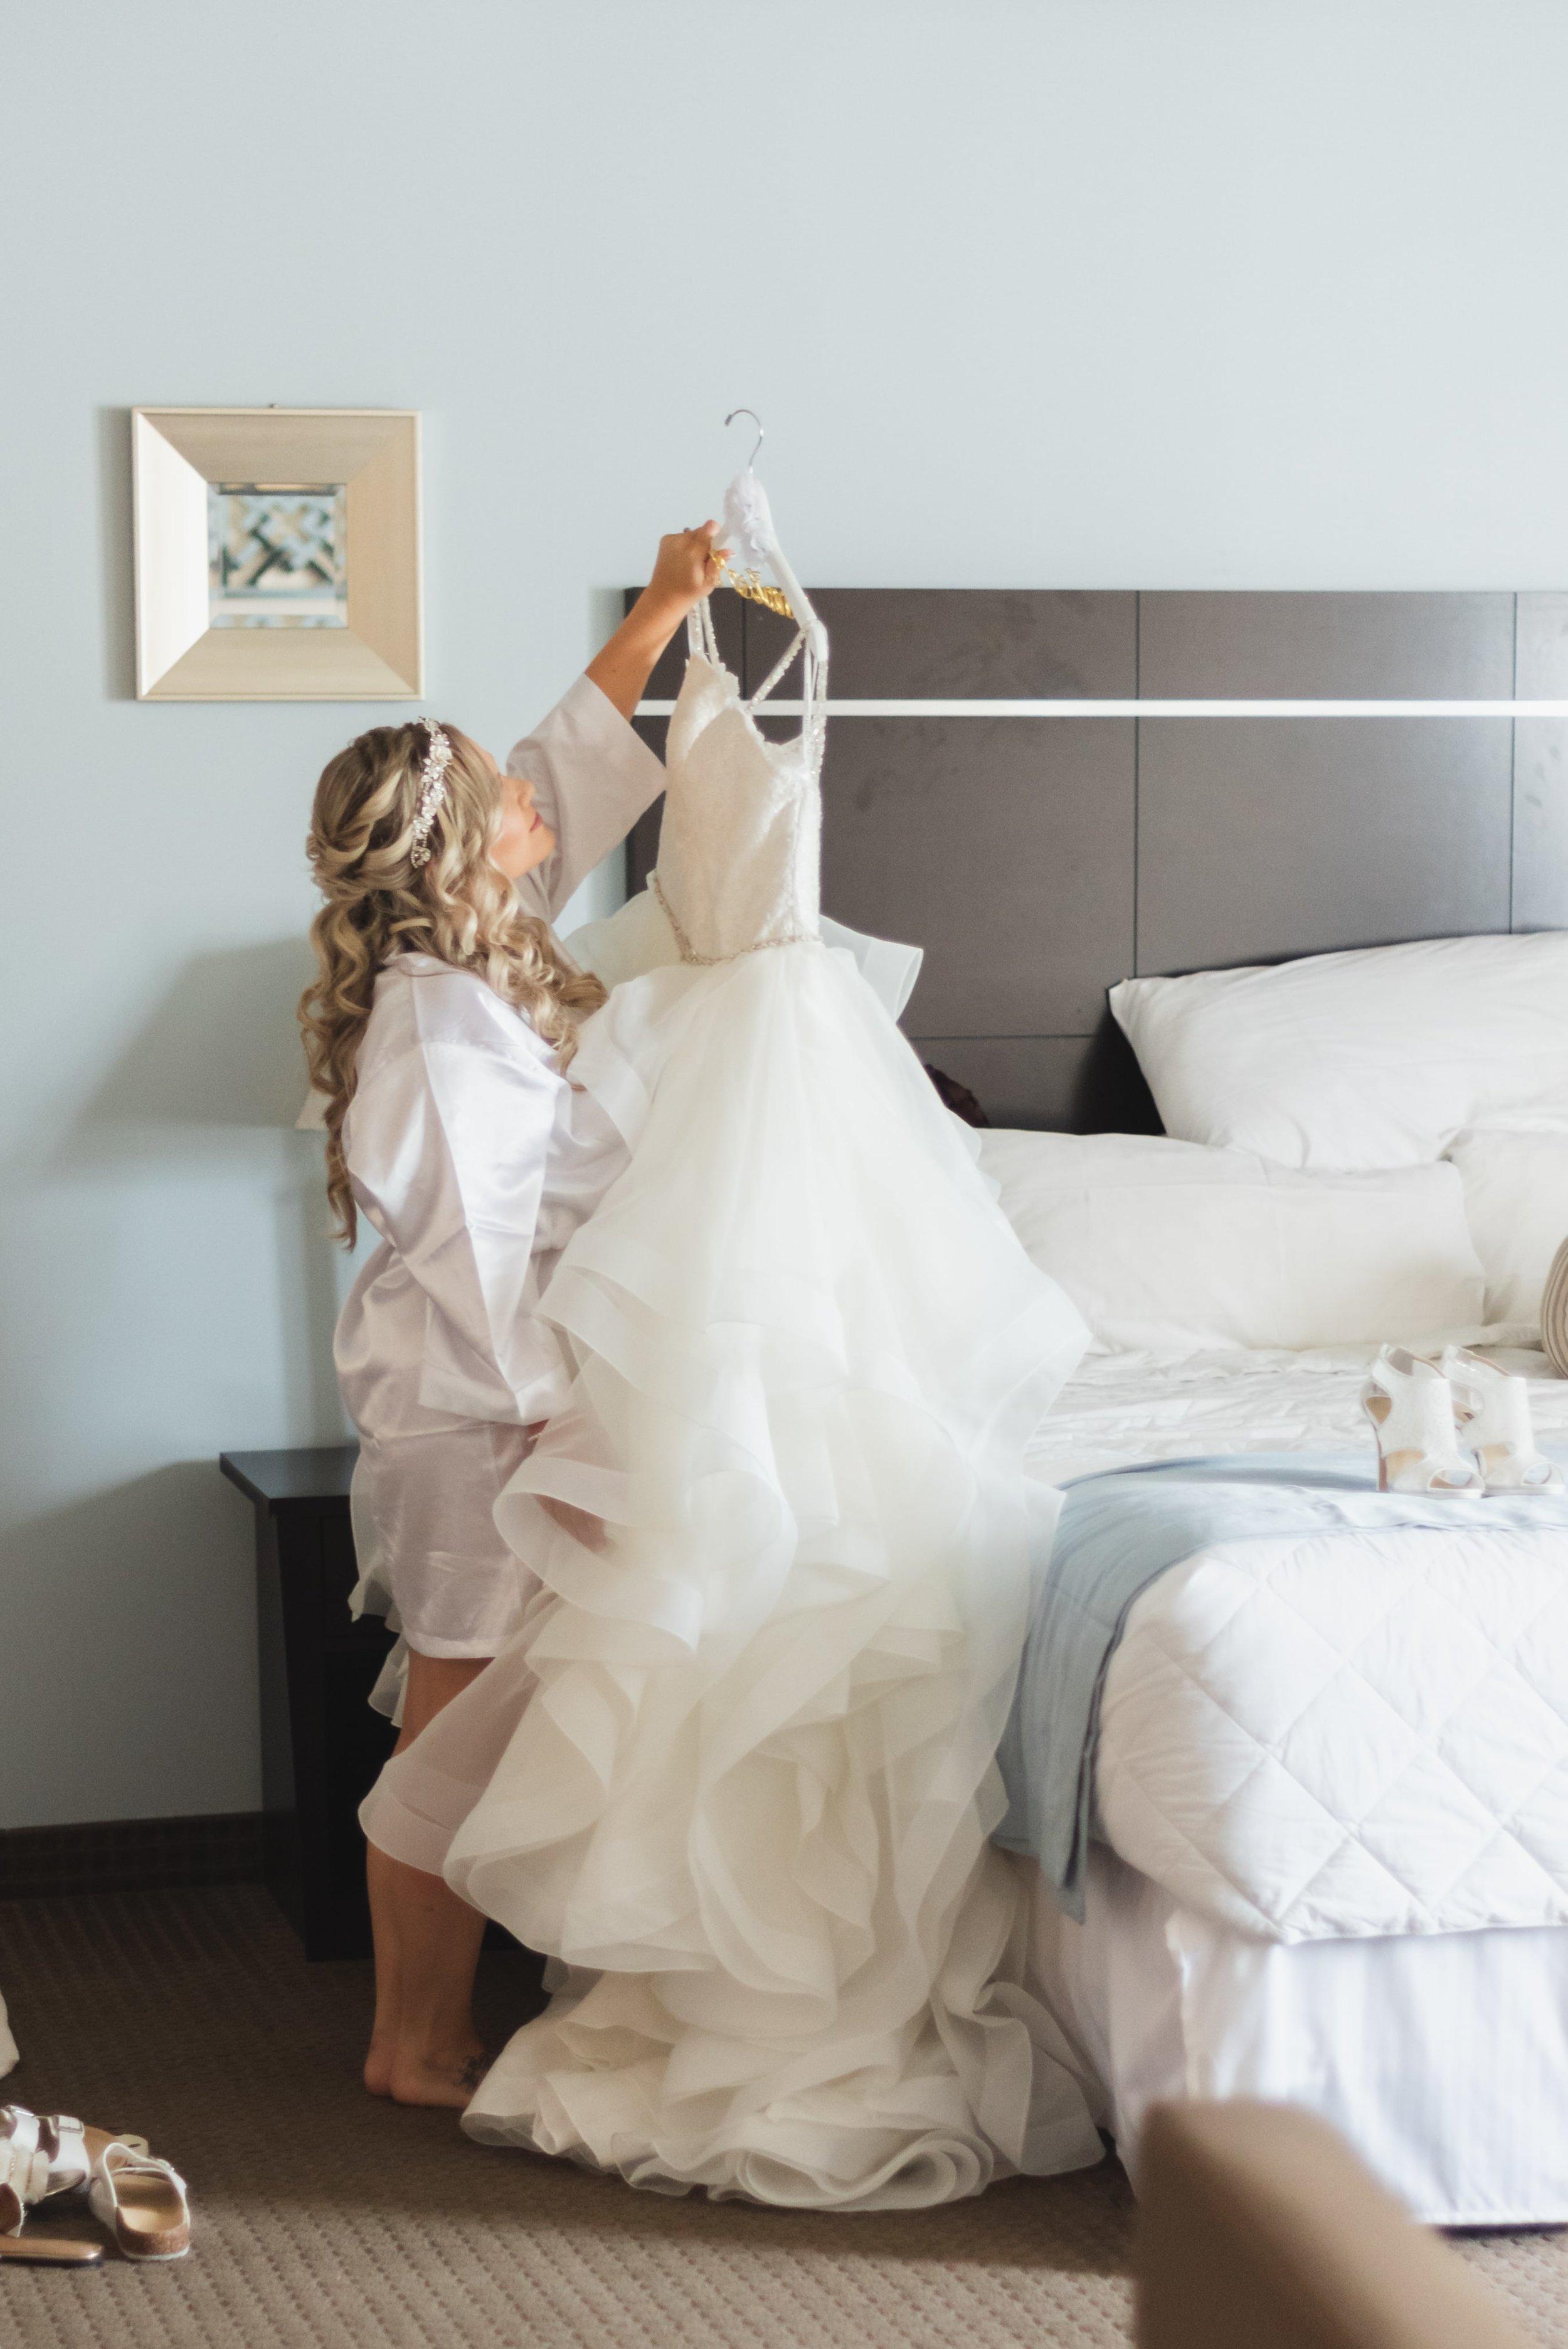 Bride lifting her wedding dress in her hotel room.